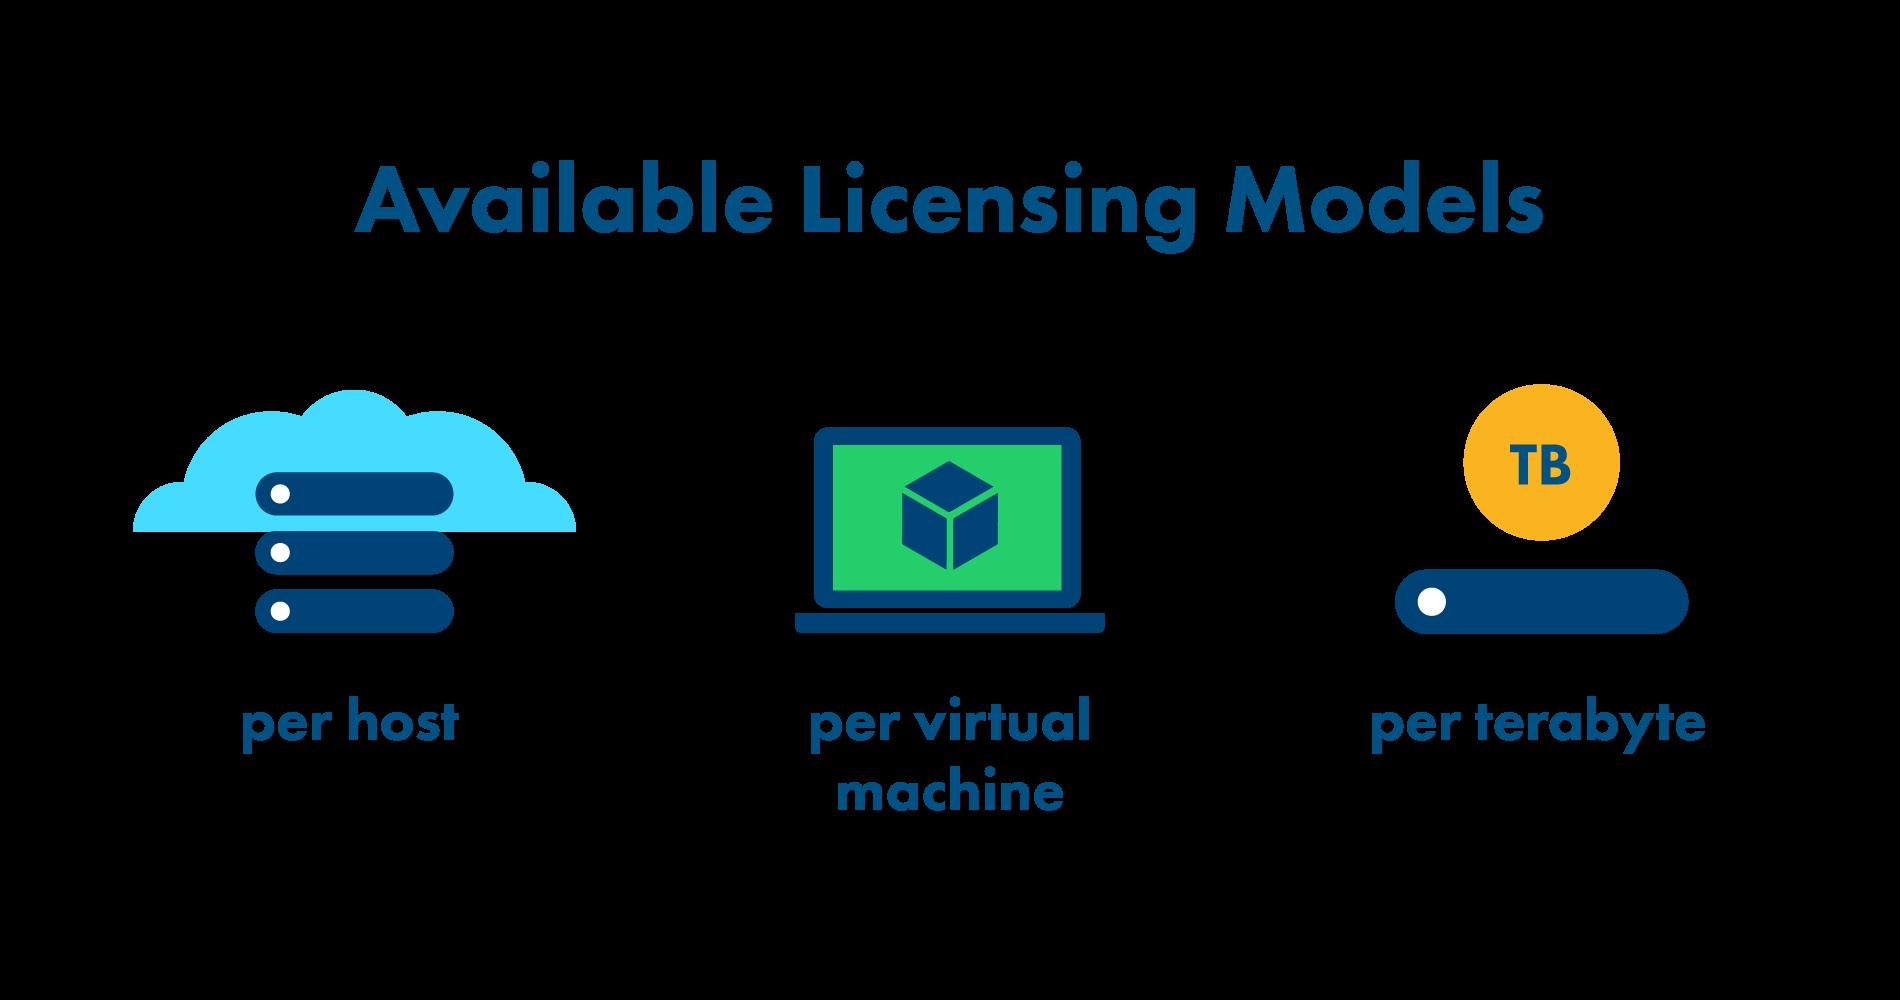 Storware vProtect licensing models